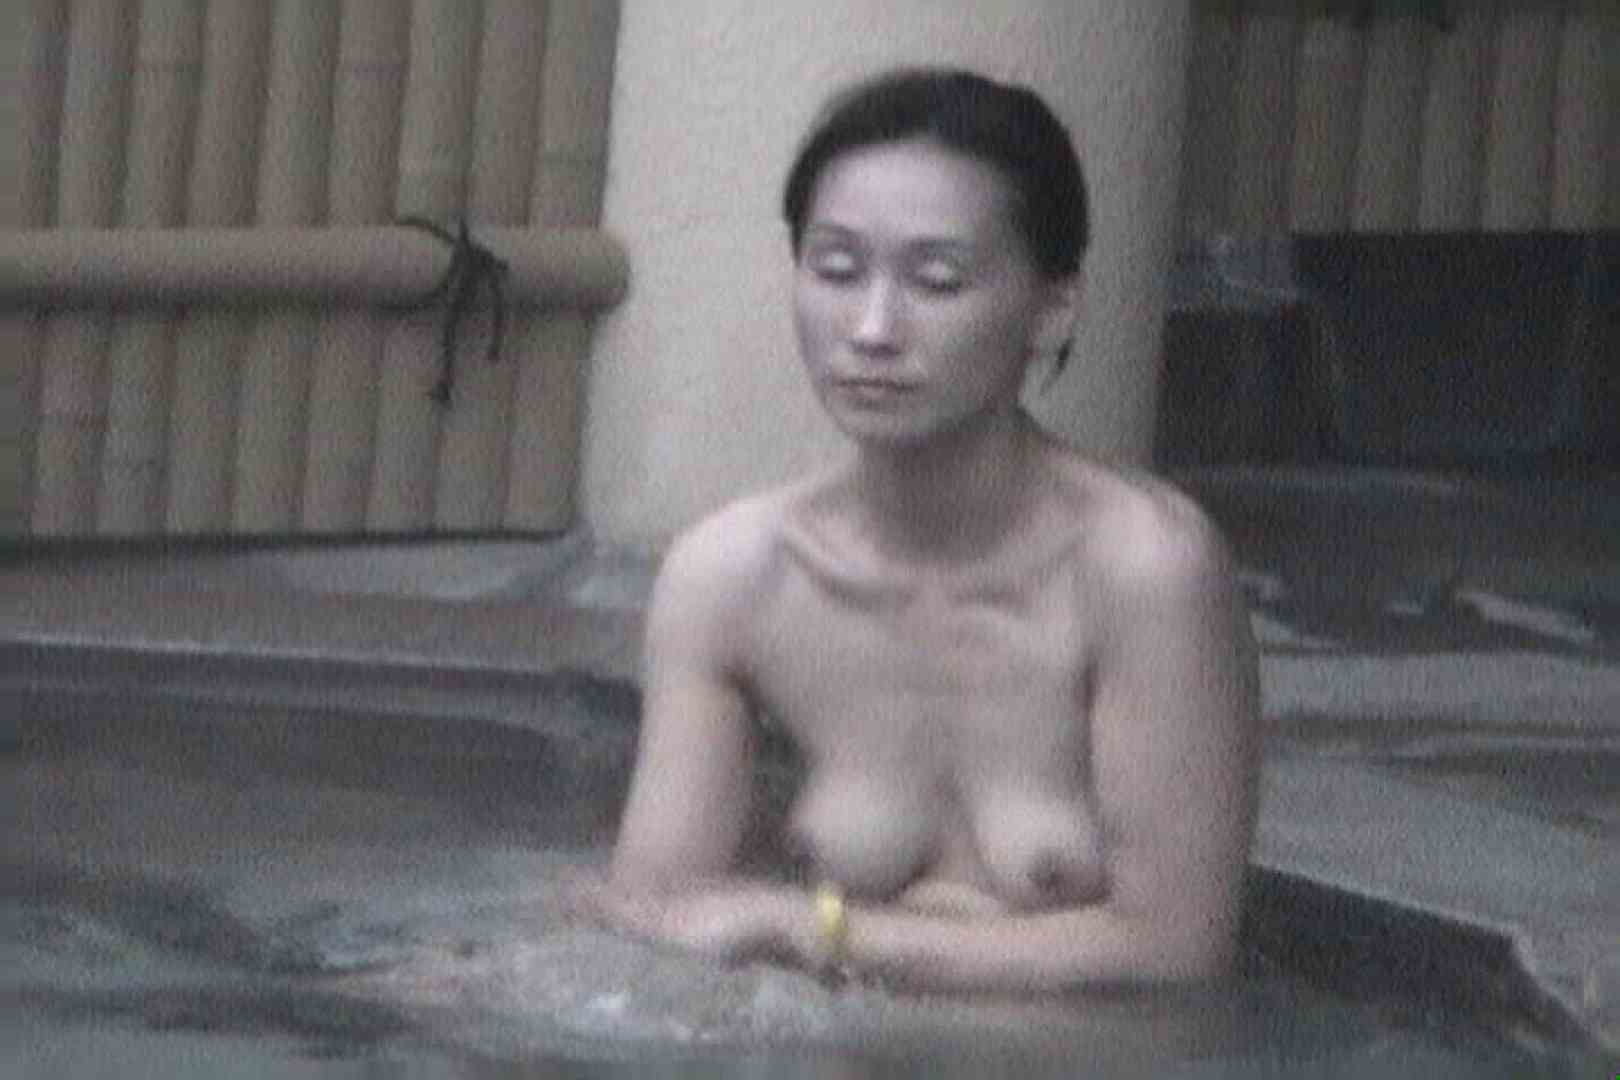 Aquaな露天風呂Vol.557 露天 われめAV動画紹介 78枚 77